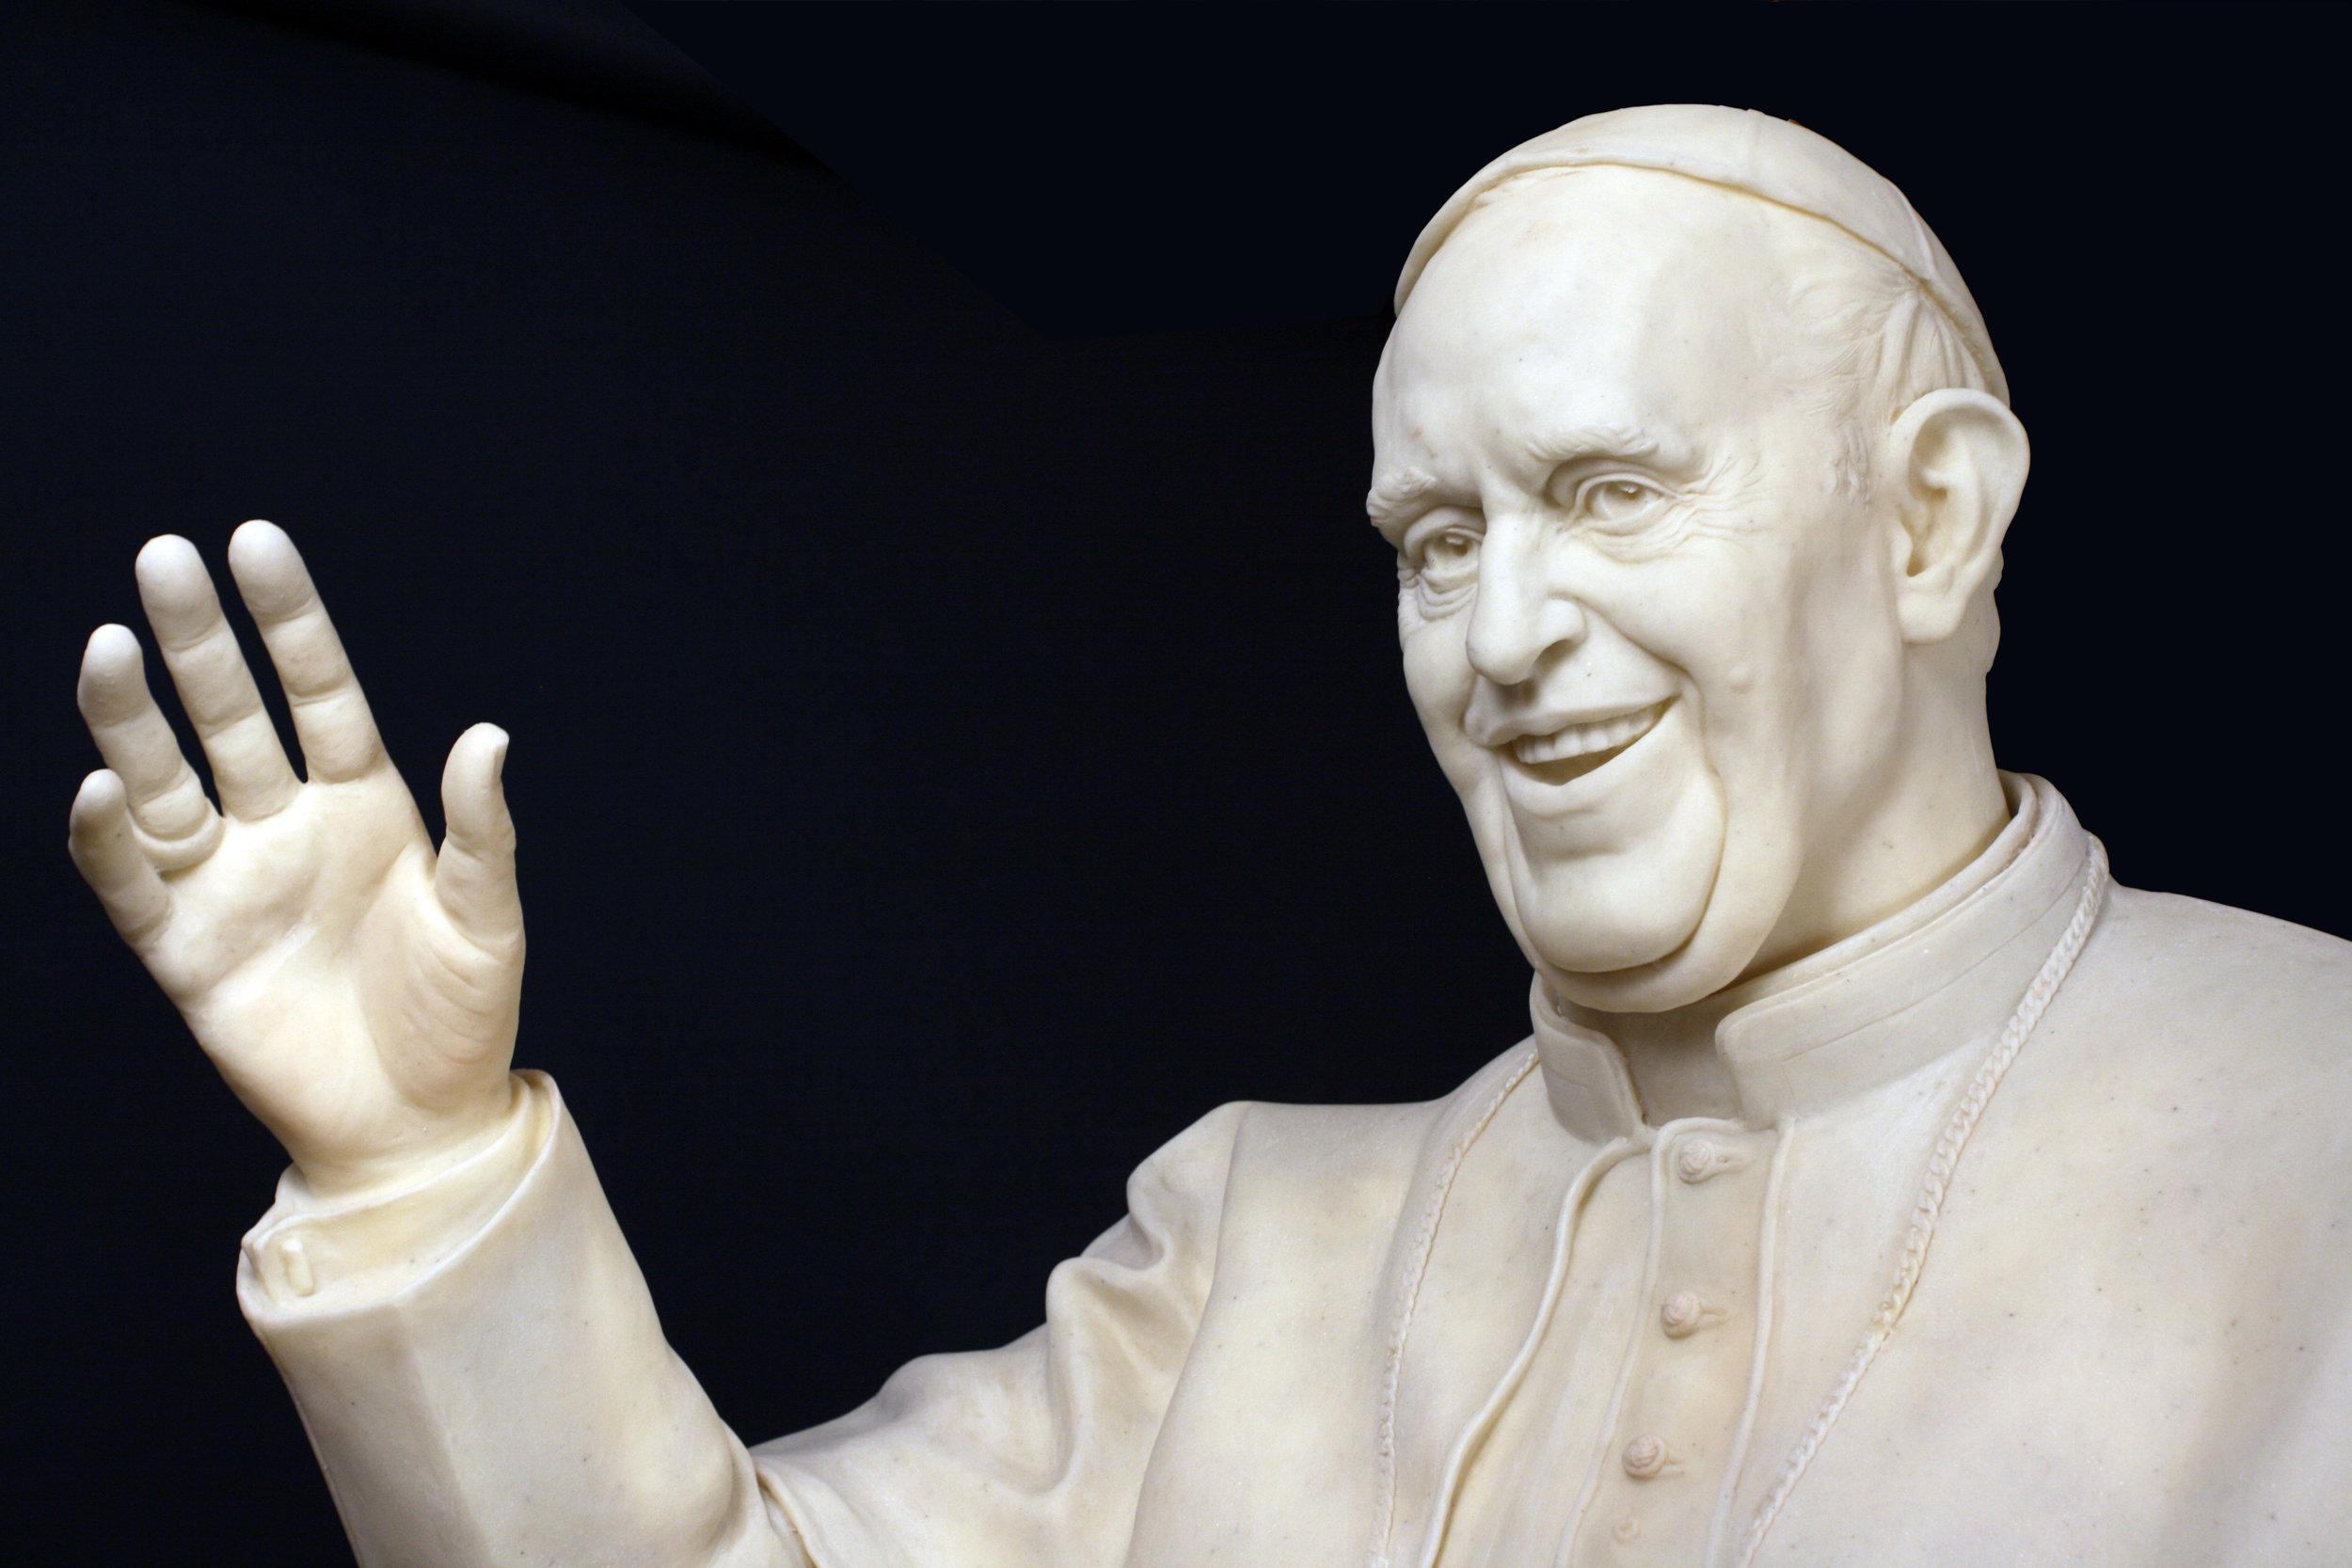 pope_cast_head_quarter2.jpg